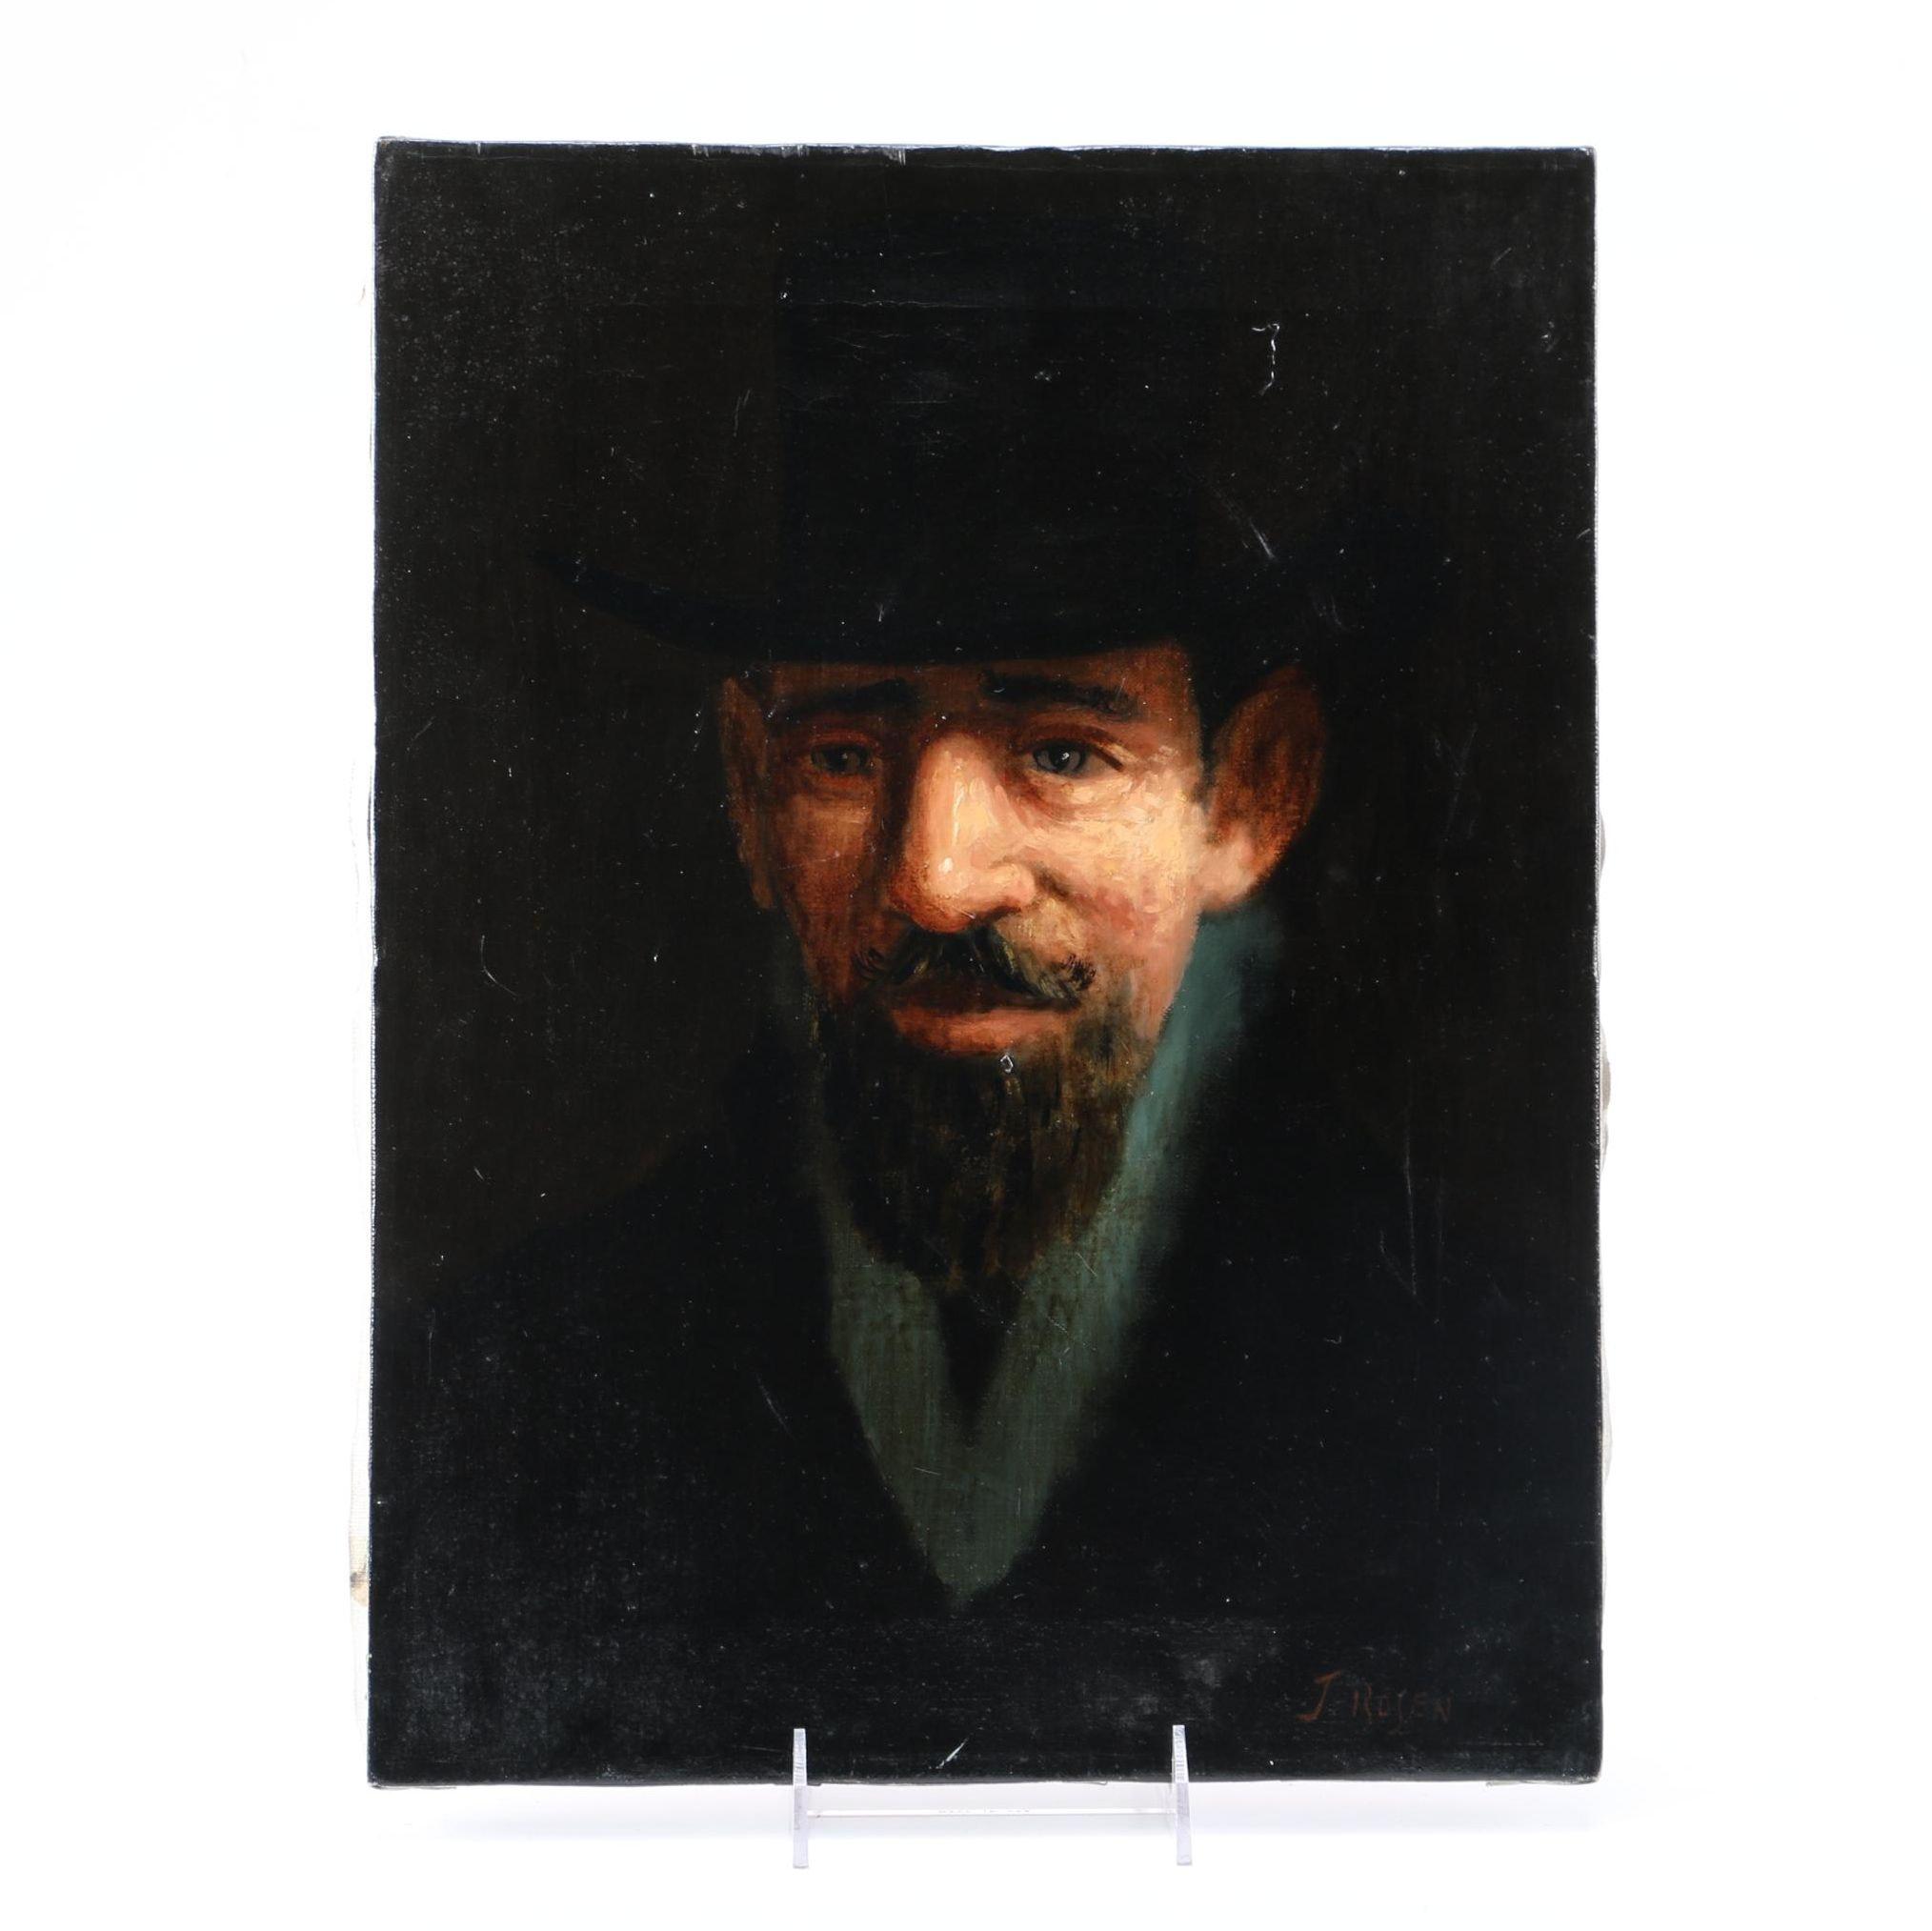 J. Rosen Oil Painting on Canvas Chiaroscuro Portrait